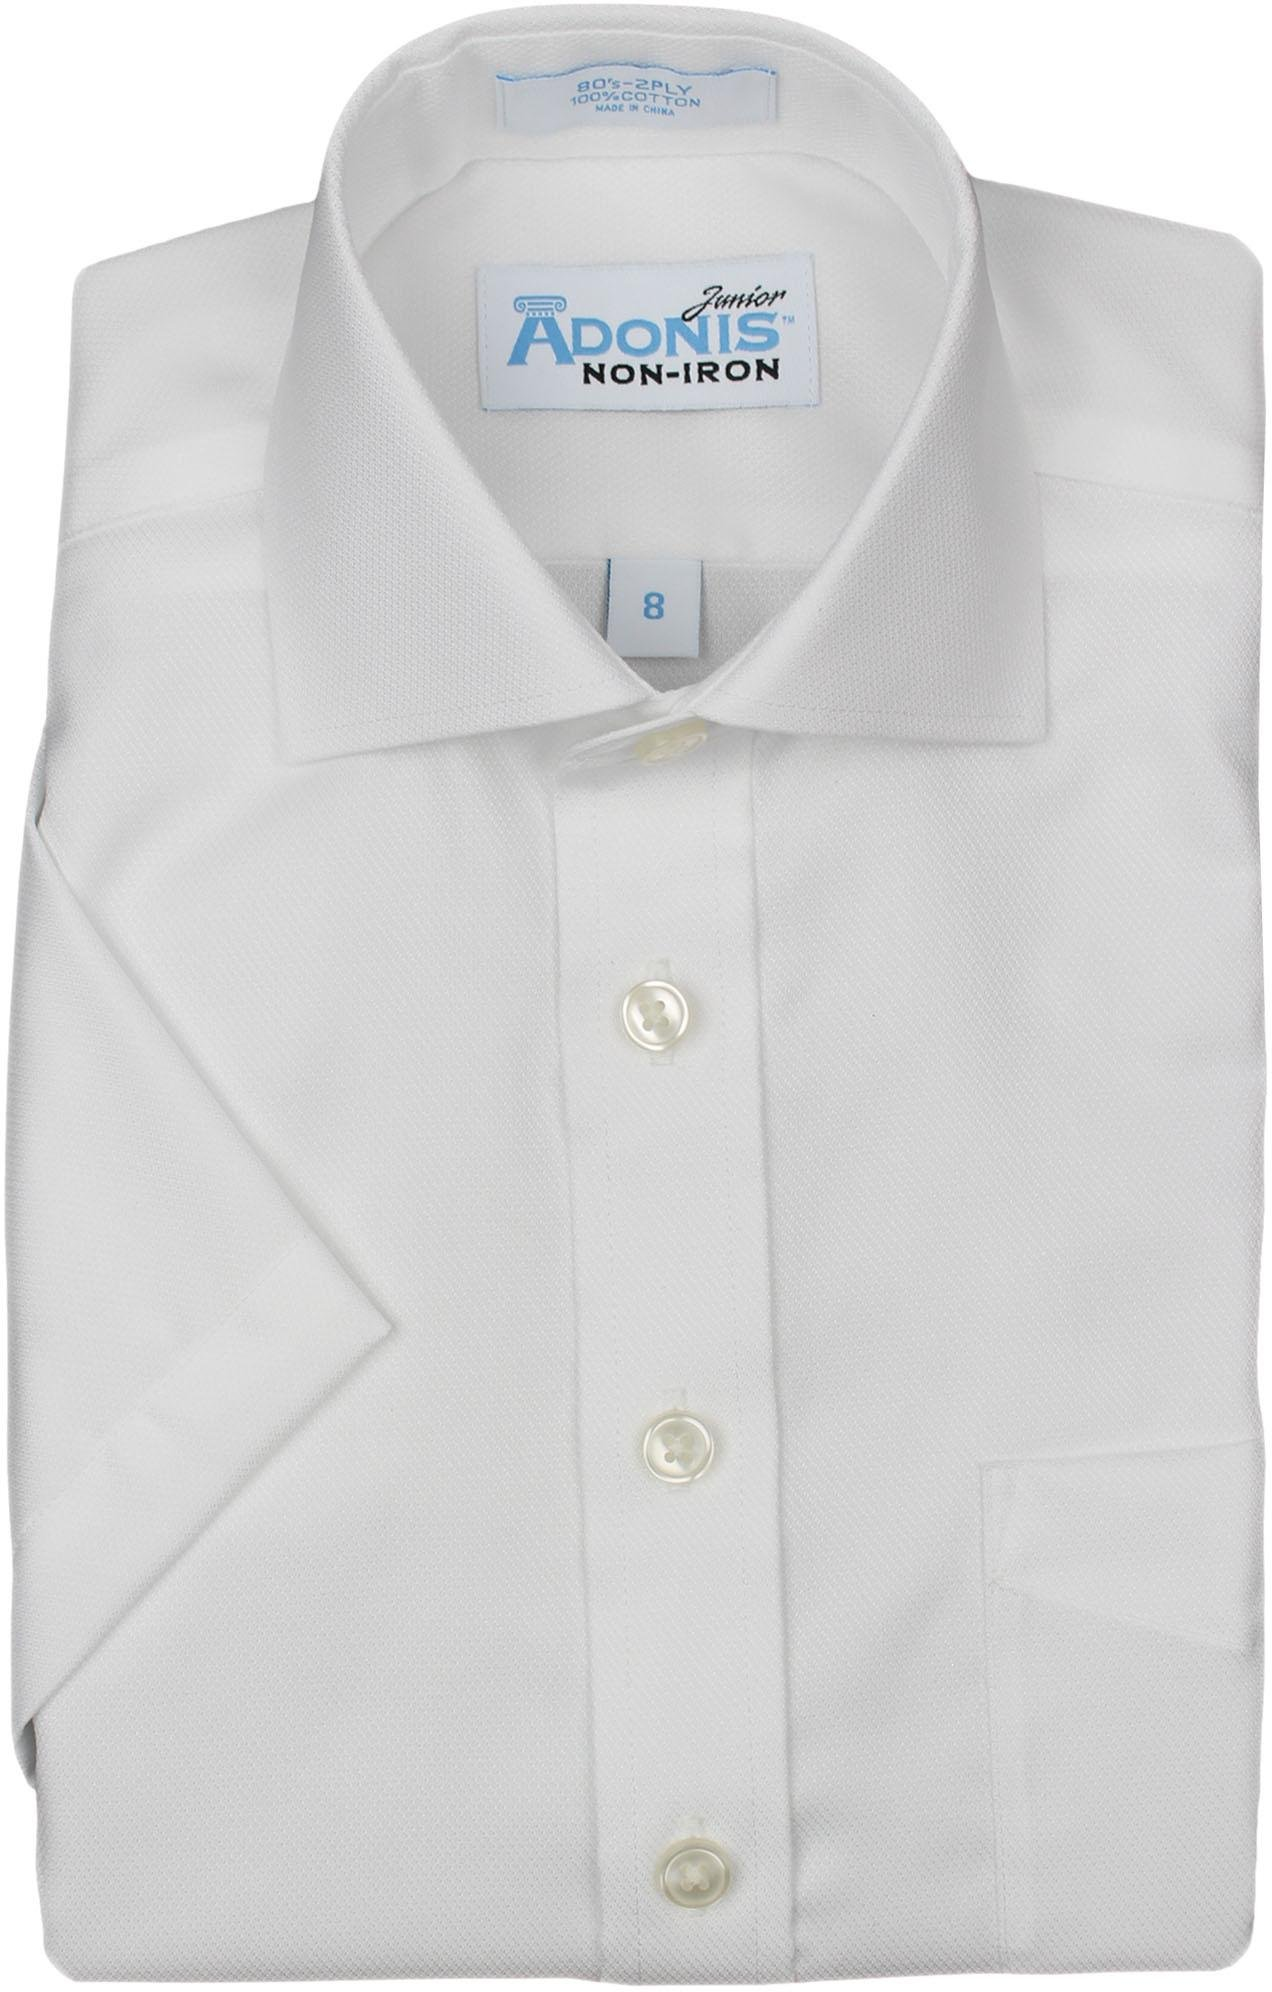 Adonis Boys 100% Cotton NI White Fine Pique Texture Short Sleeve Dress Shirt - White, 18